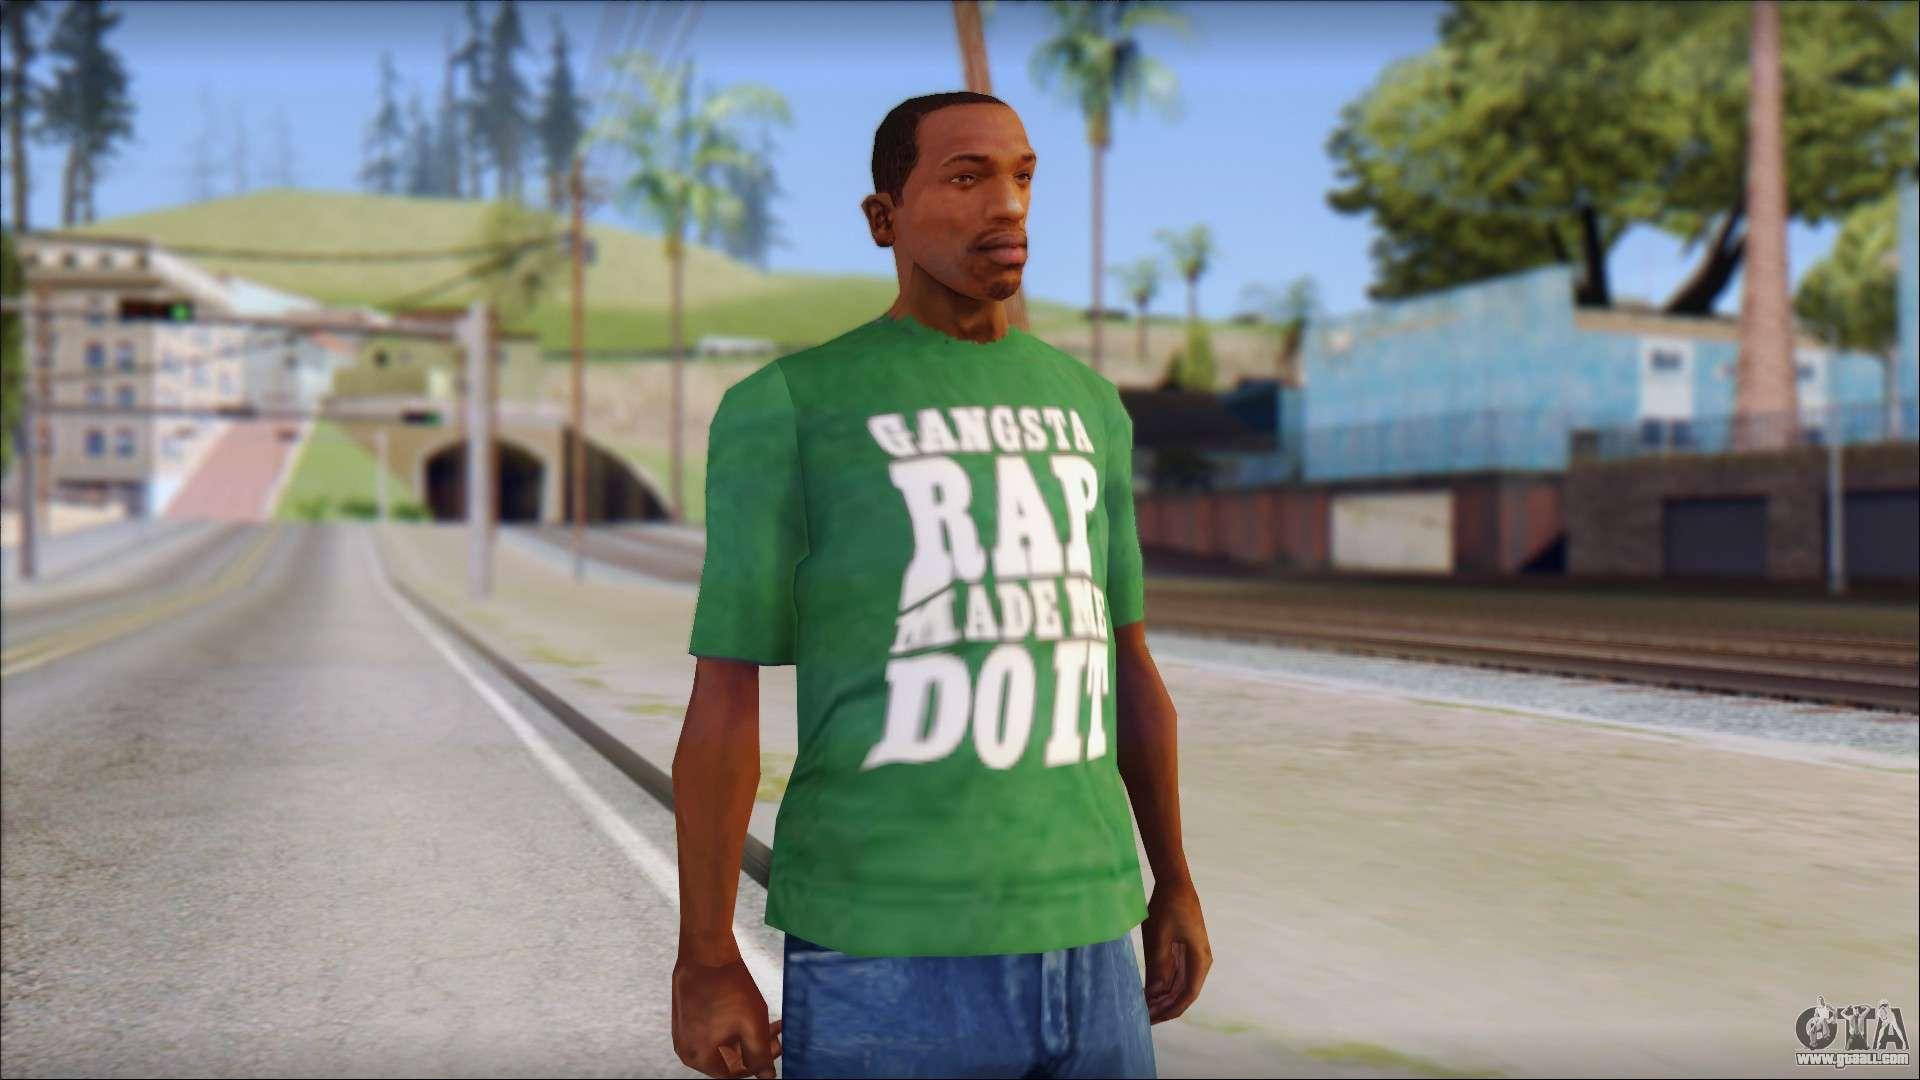 Ice Cube Gta sa Ice Cube T-shirt For Gta San